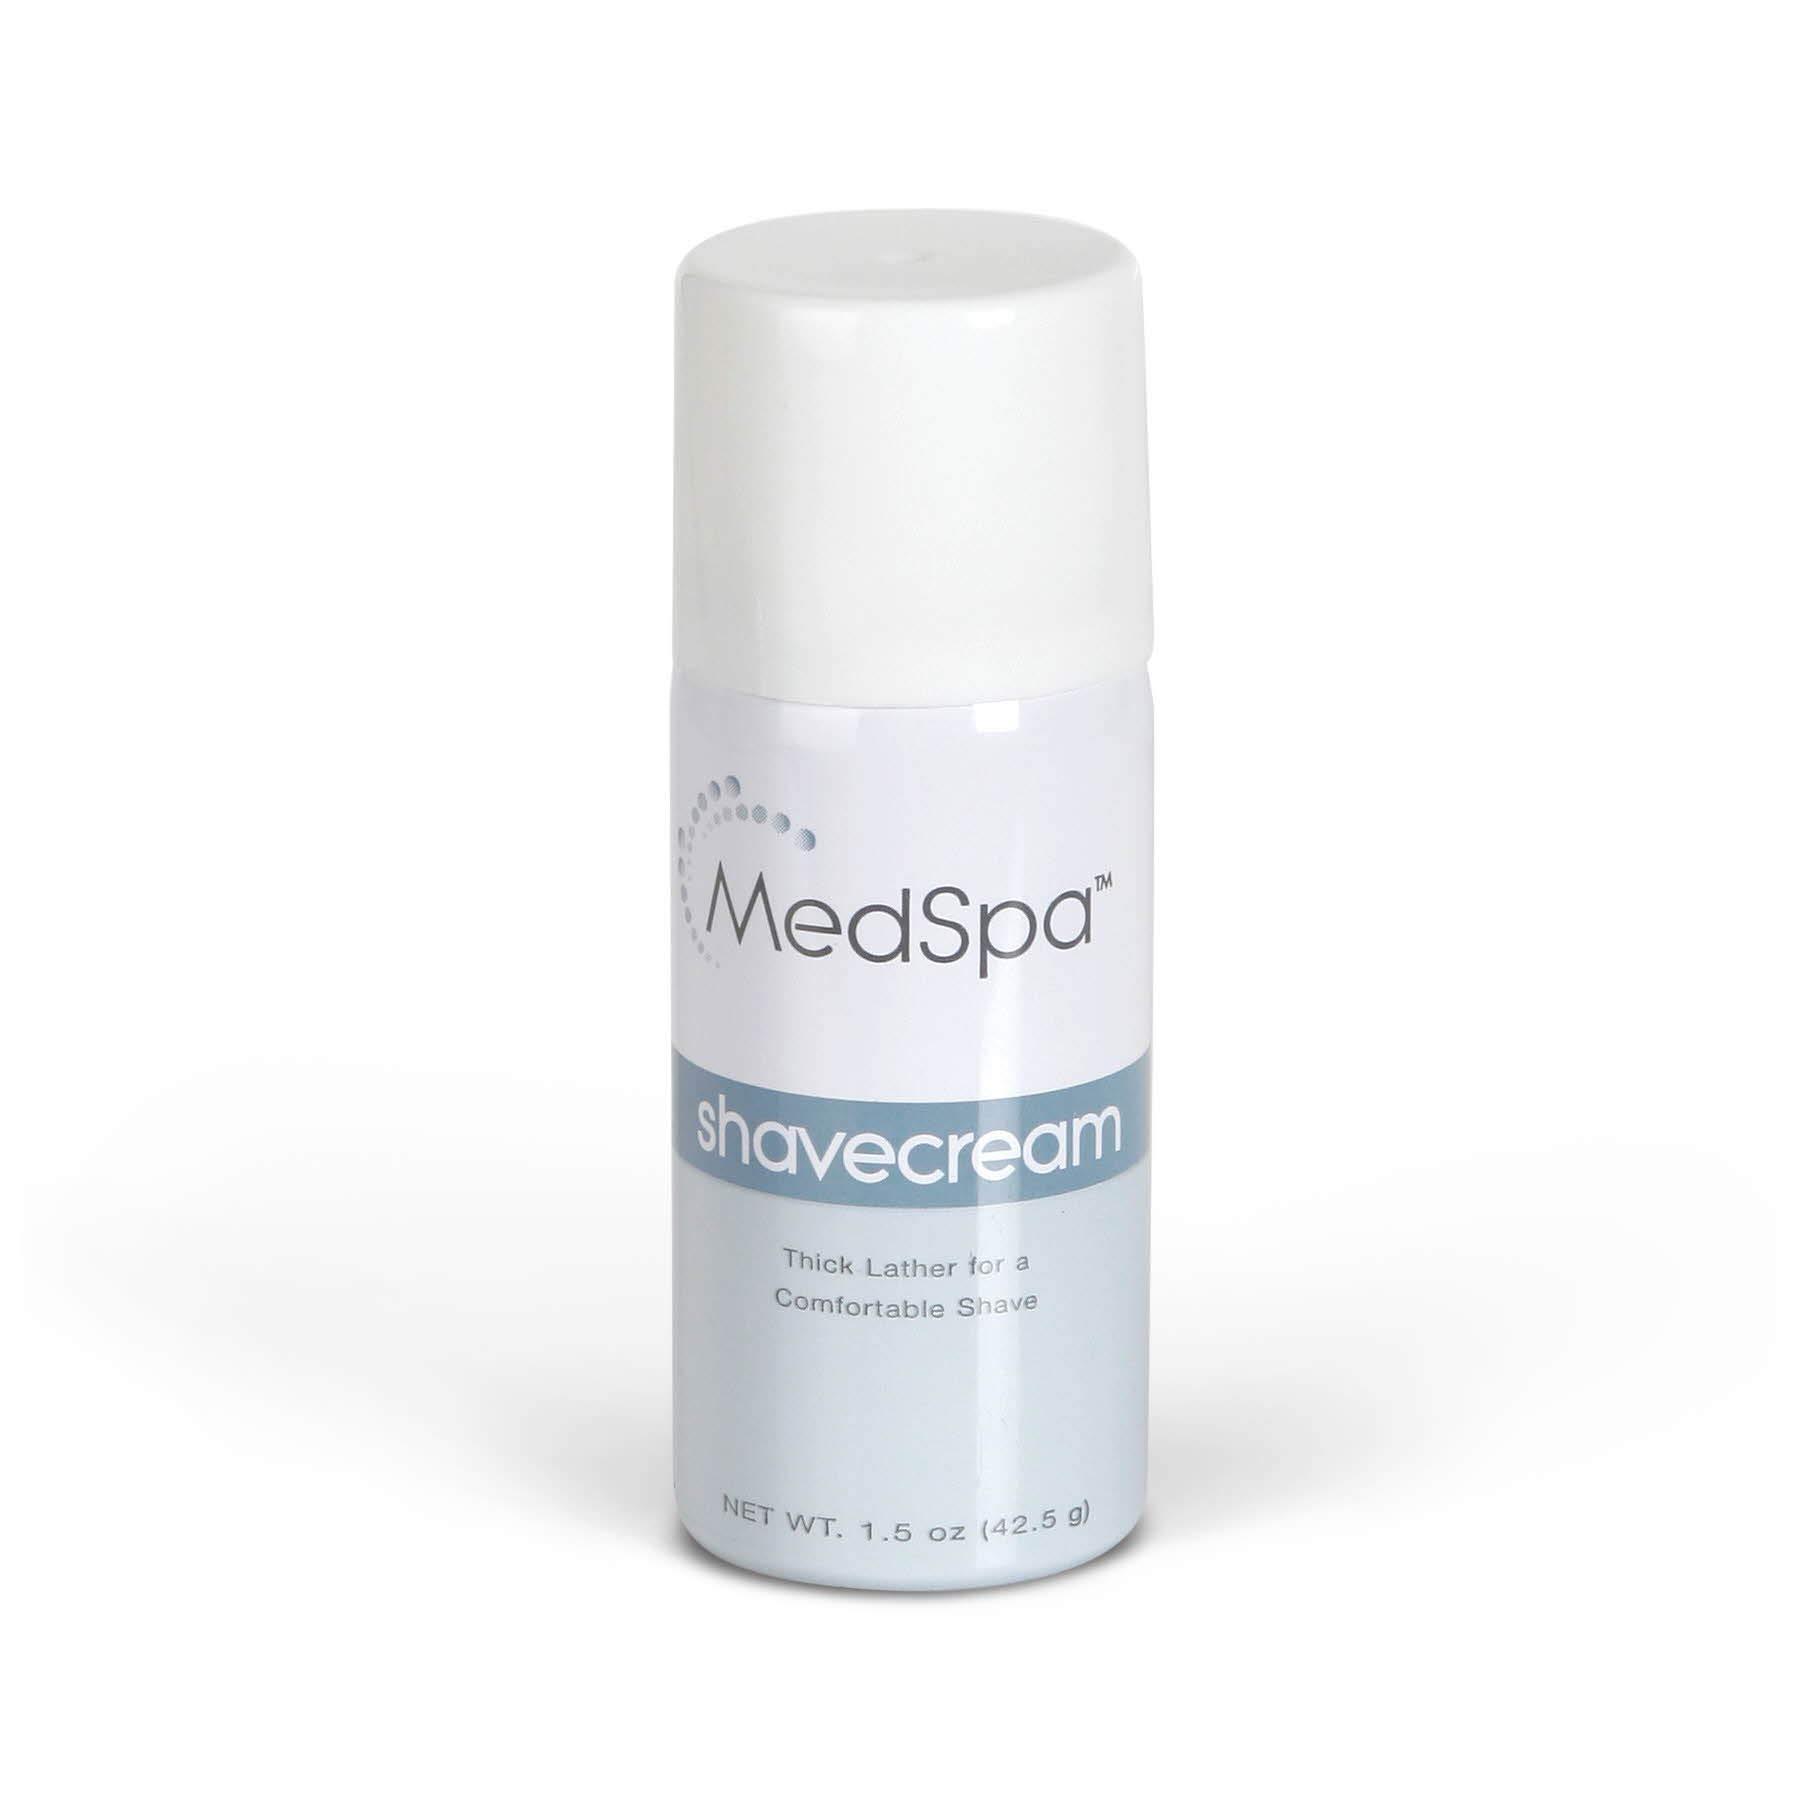 Medline MSC095014 MedSpa Shave Cream, 1.5 oz (Pack of 144)